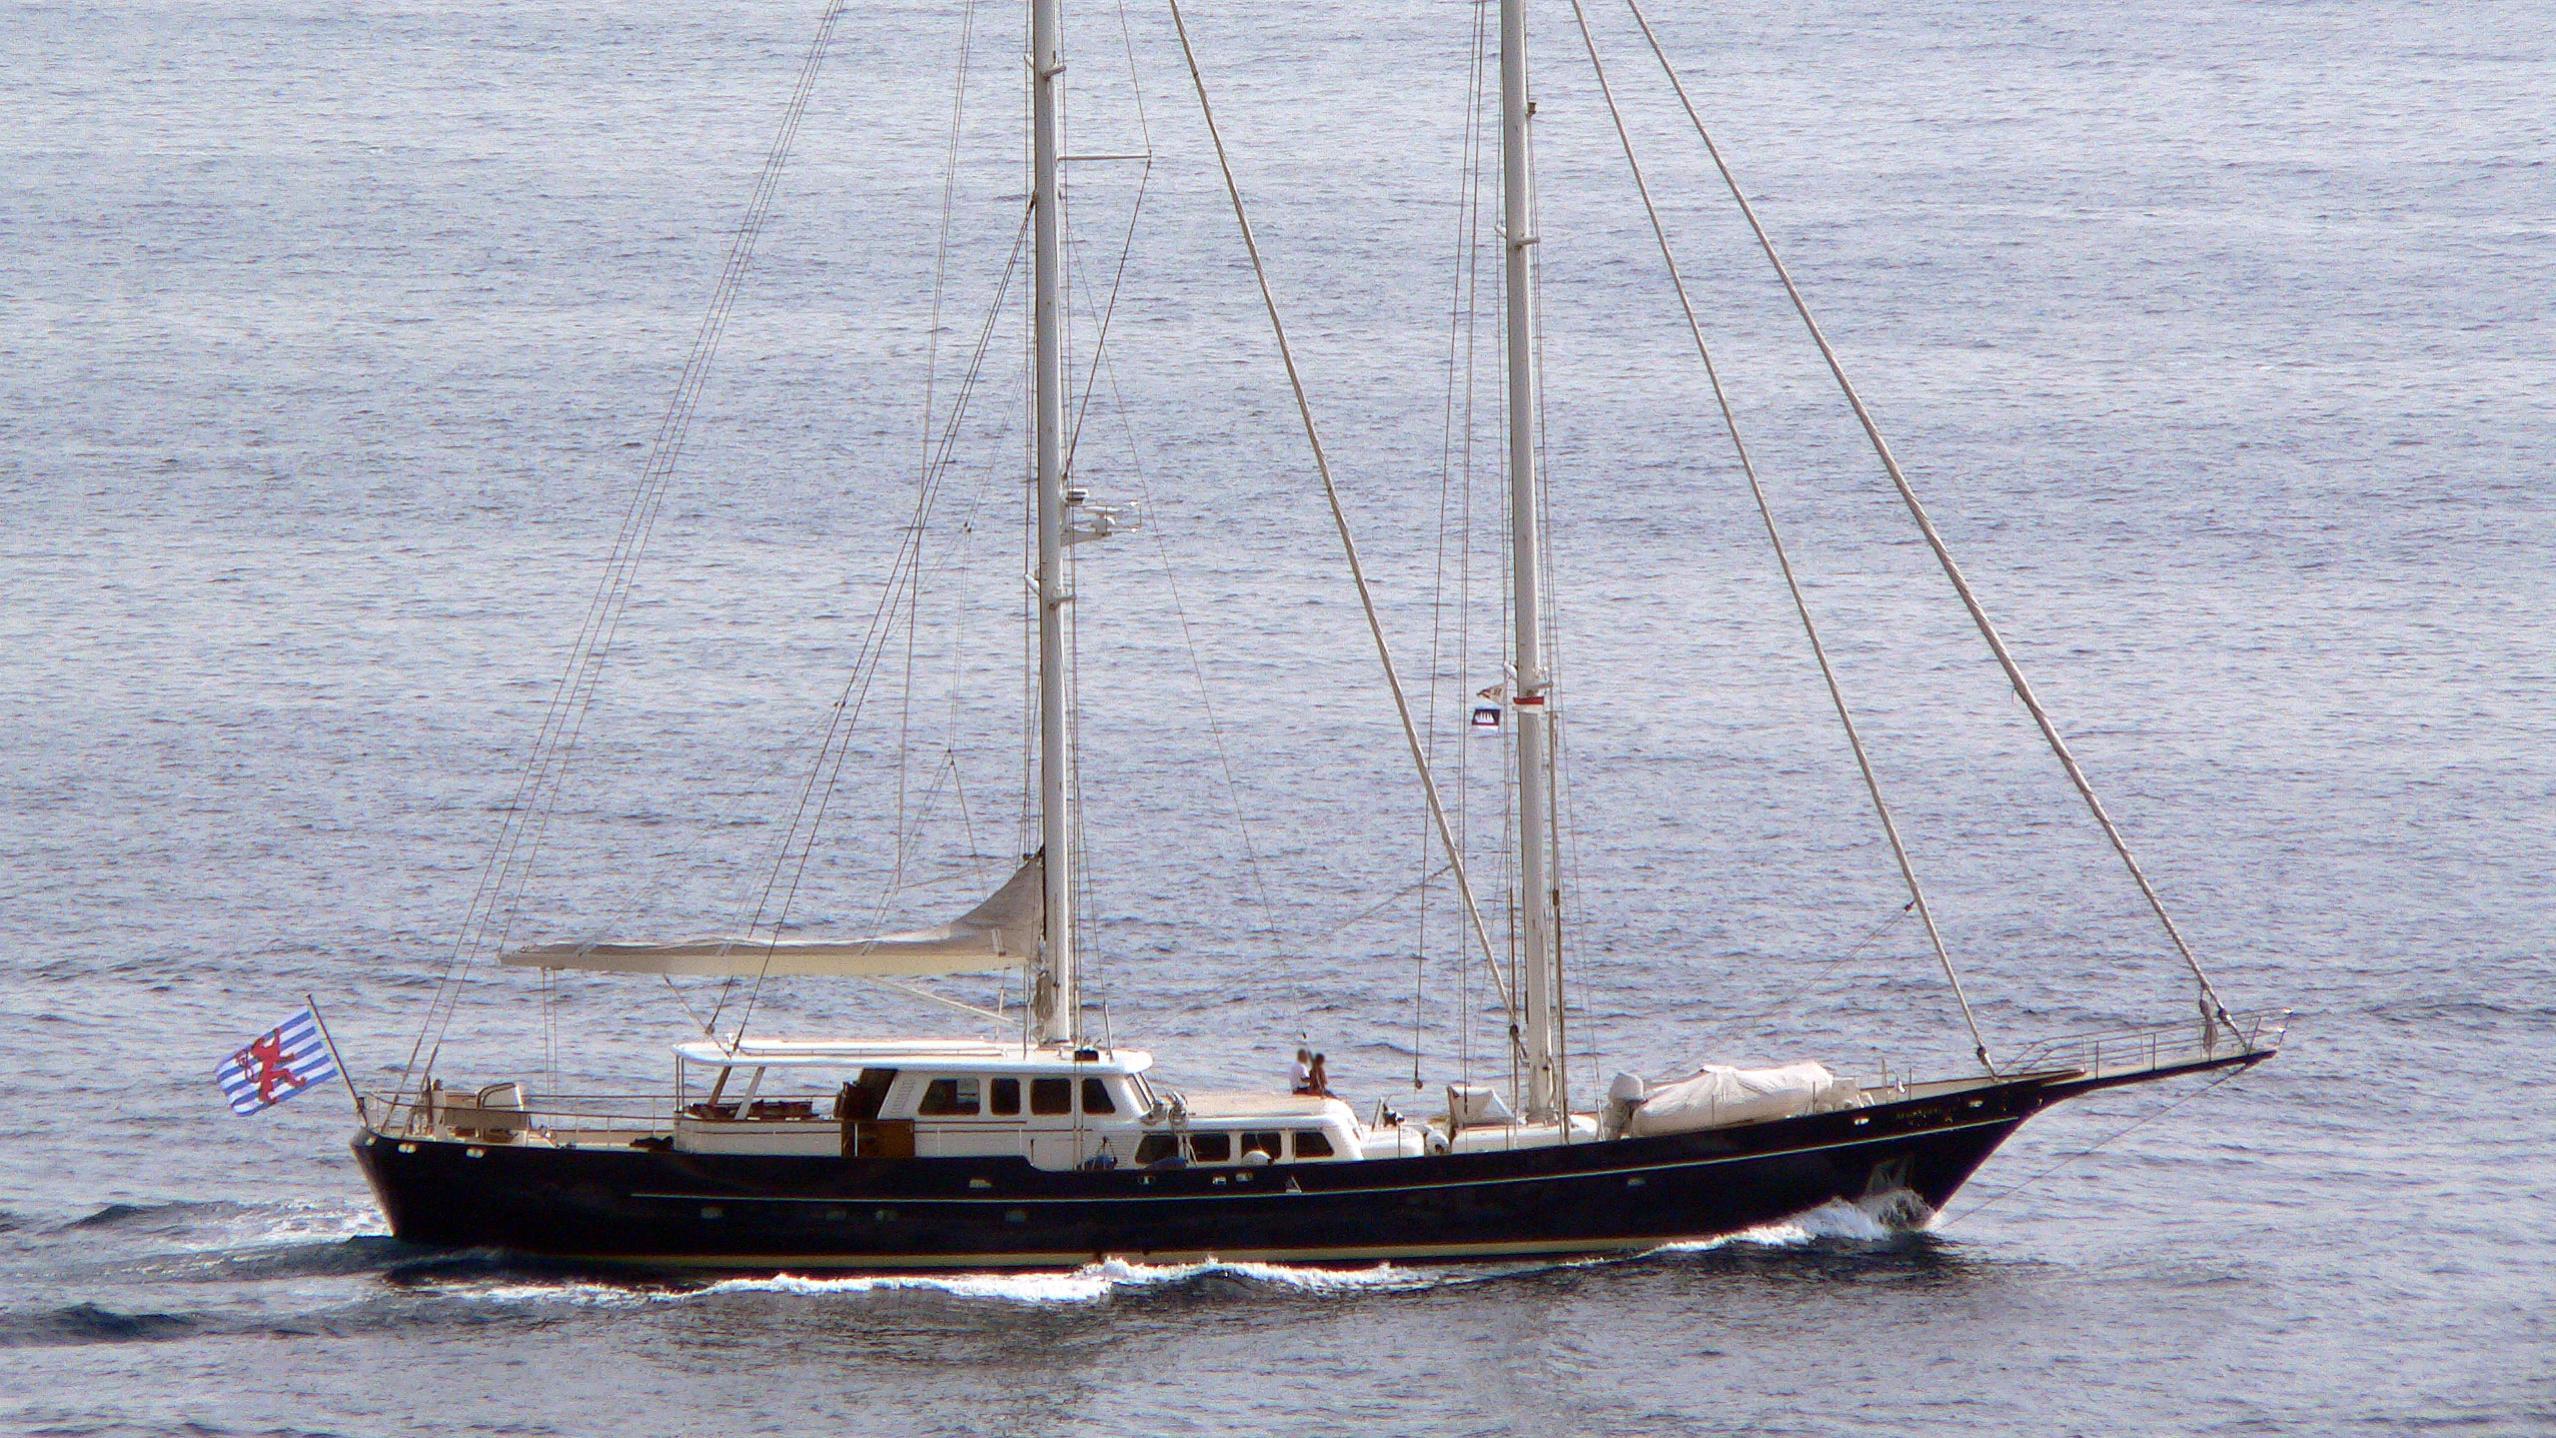 six-plus-too-sailing-yacht-cammenga-1971-38m-cruising-profile